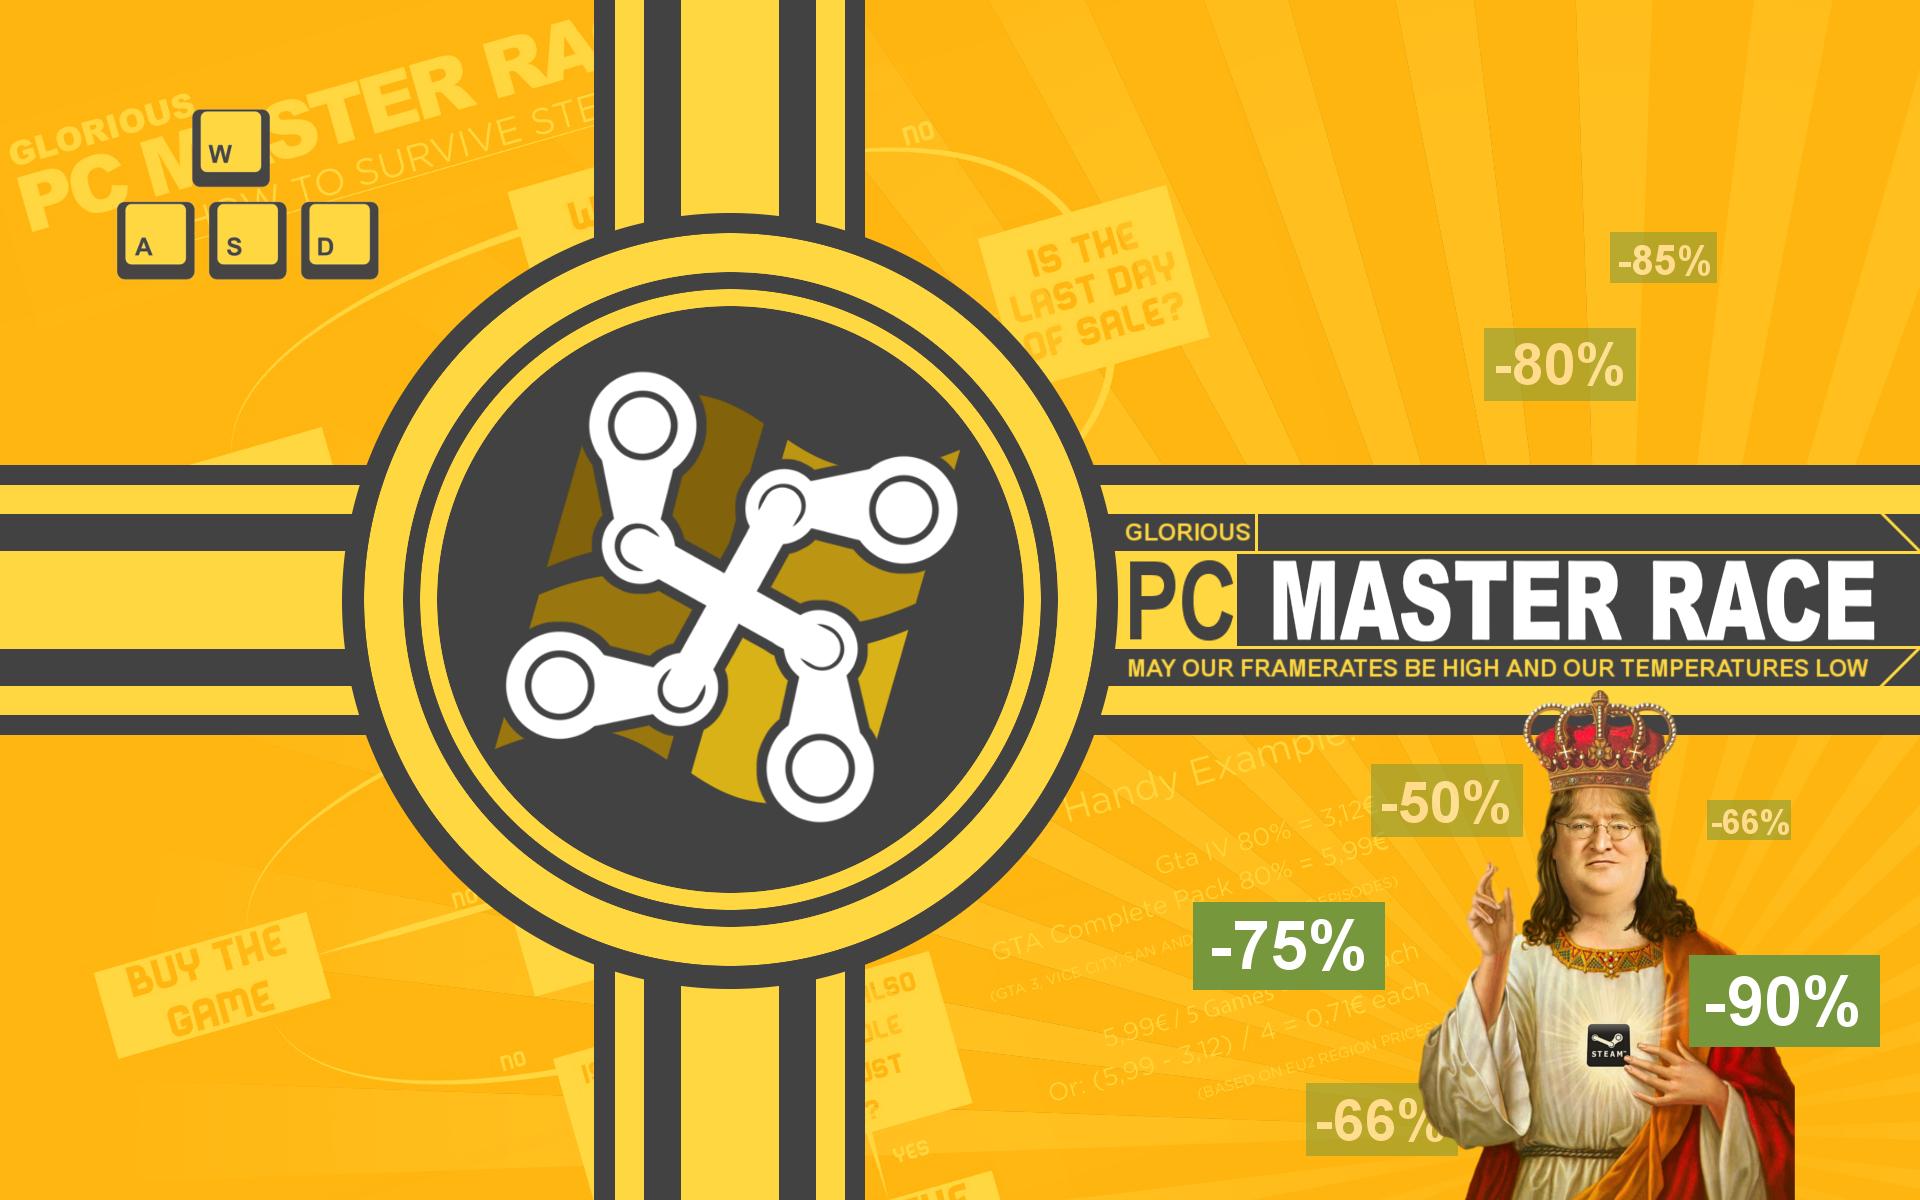 Pcmr Wallpaper: Rust Steam Key : Pcmasterrace